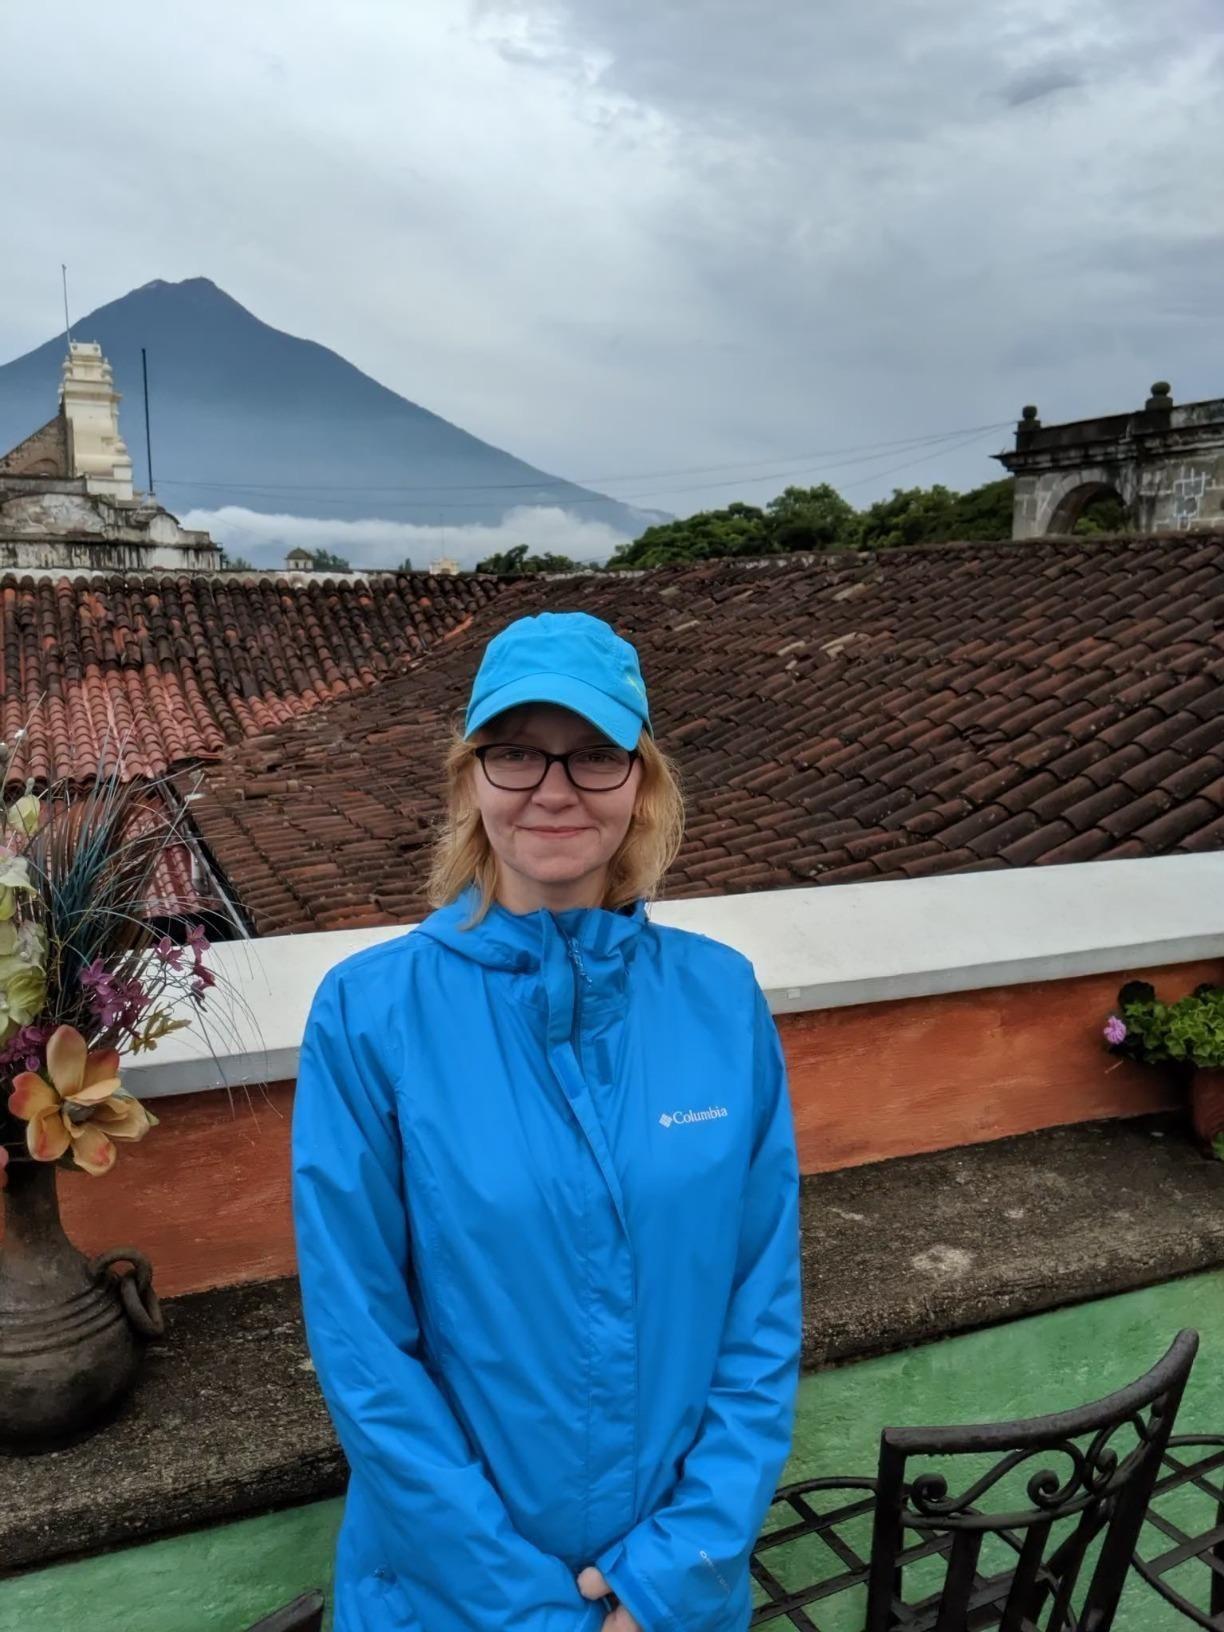 Reviewer wears blue waterproof rain jacket while enjoying a mountain view